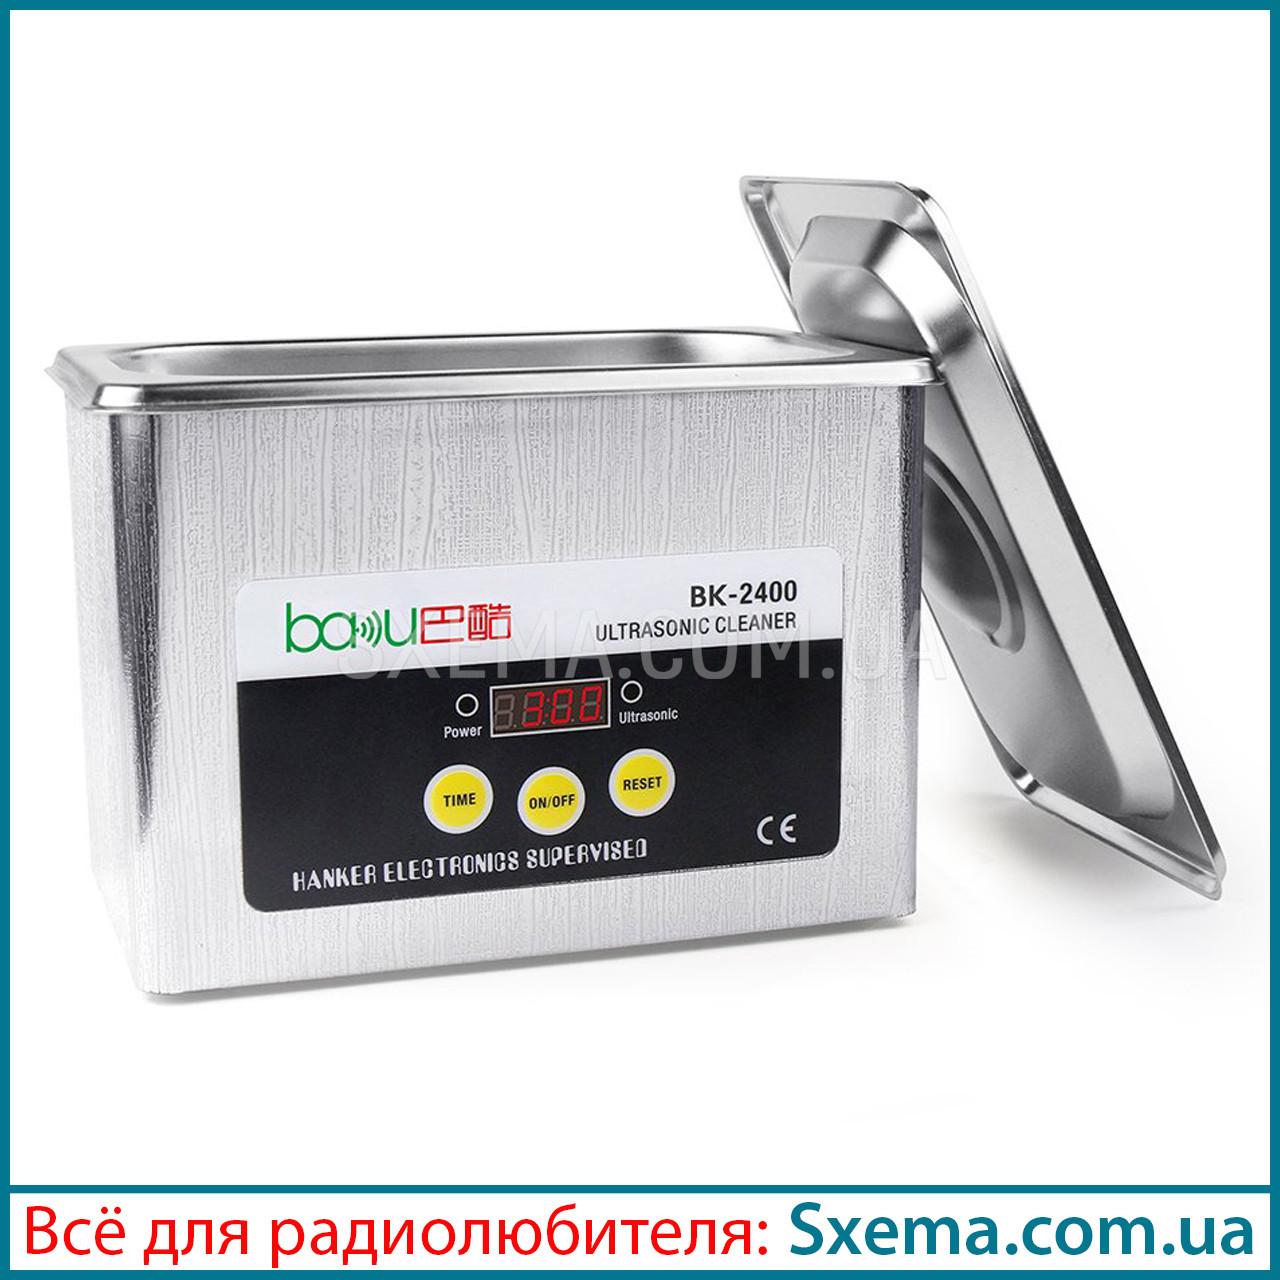 Ультразвуковая мойка BAKU BK-2400 (0.8L, 35W, 42 kHz) с таймером